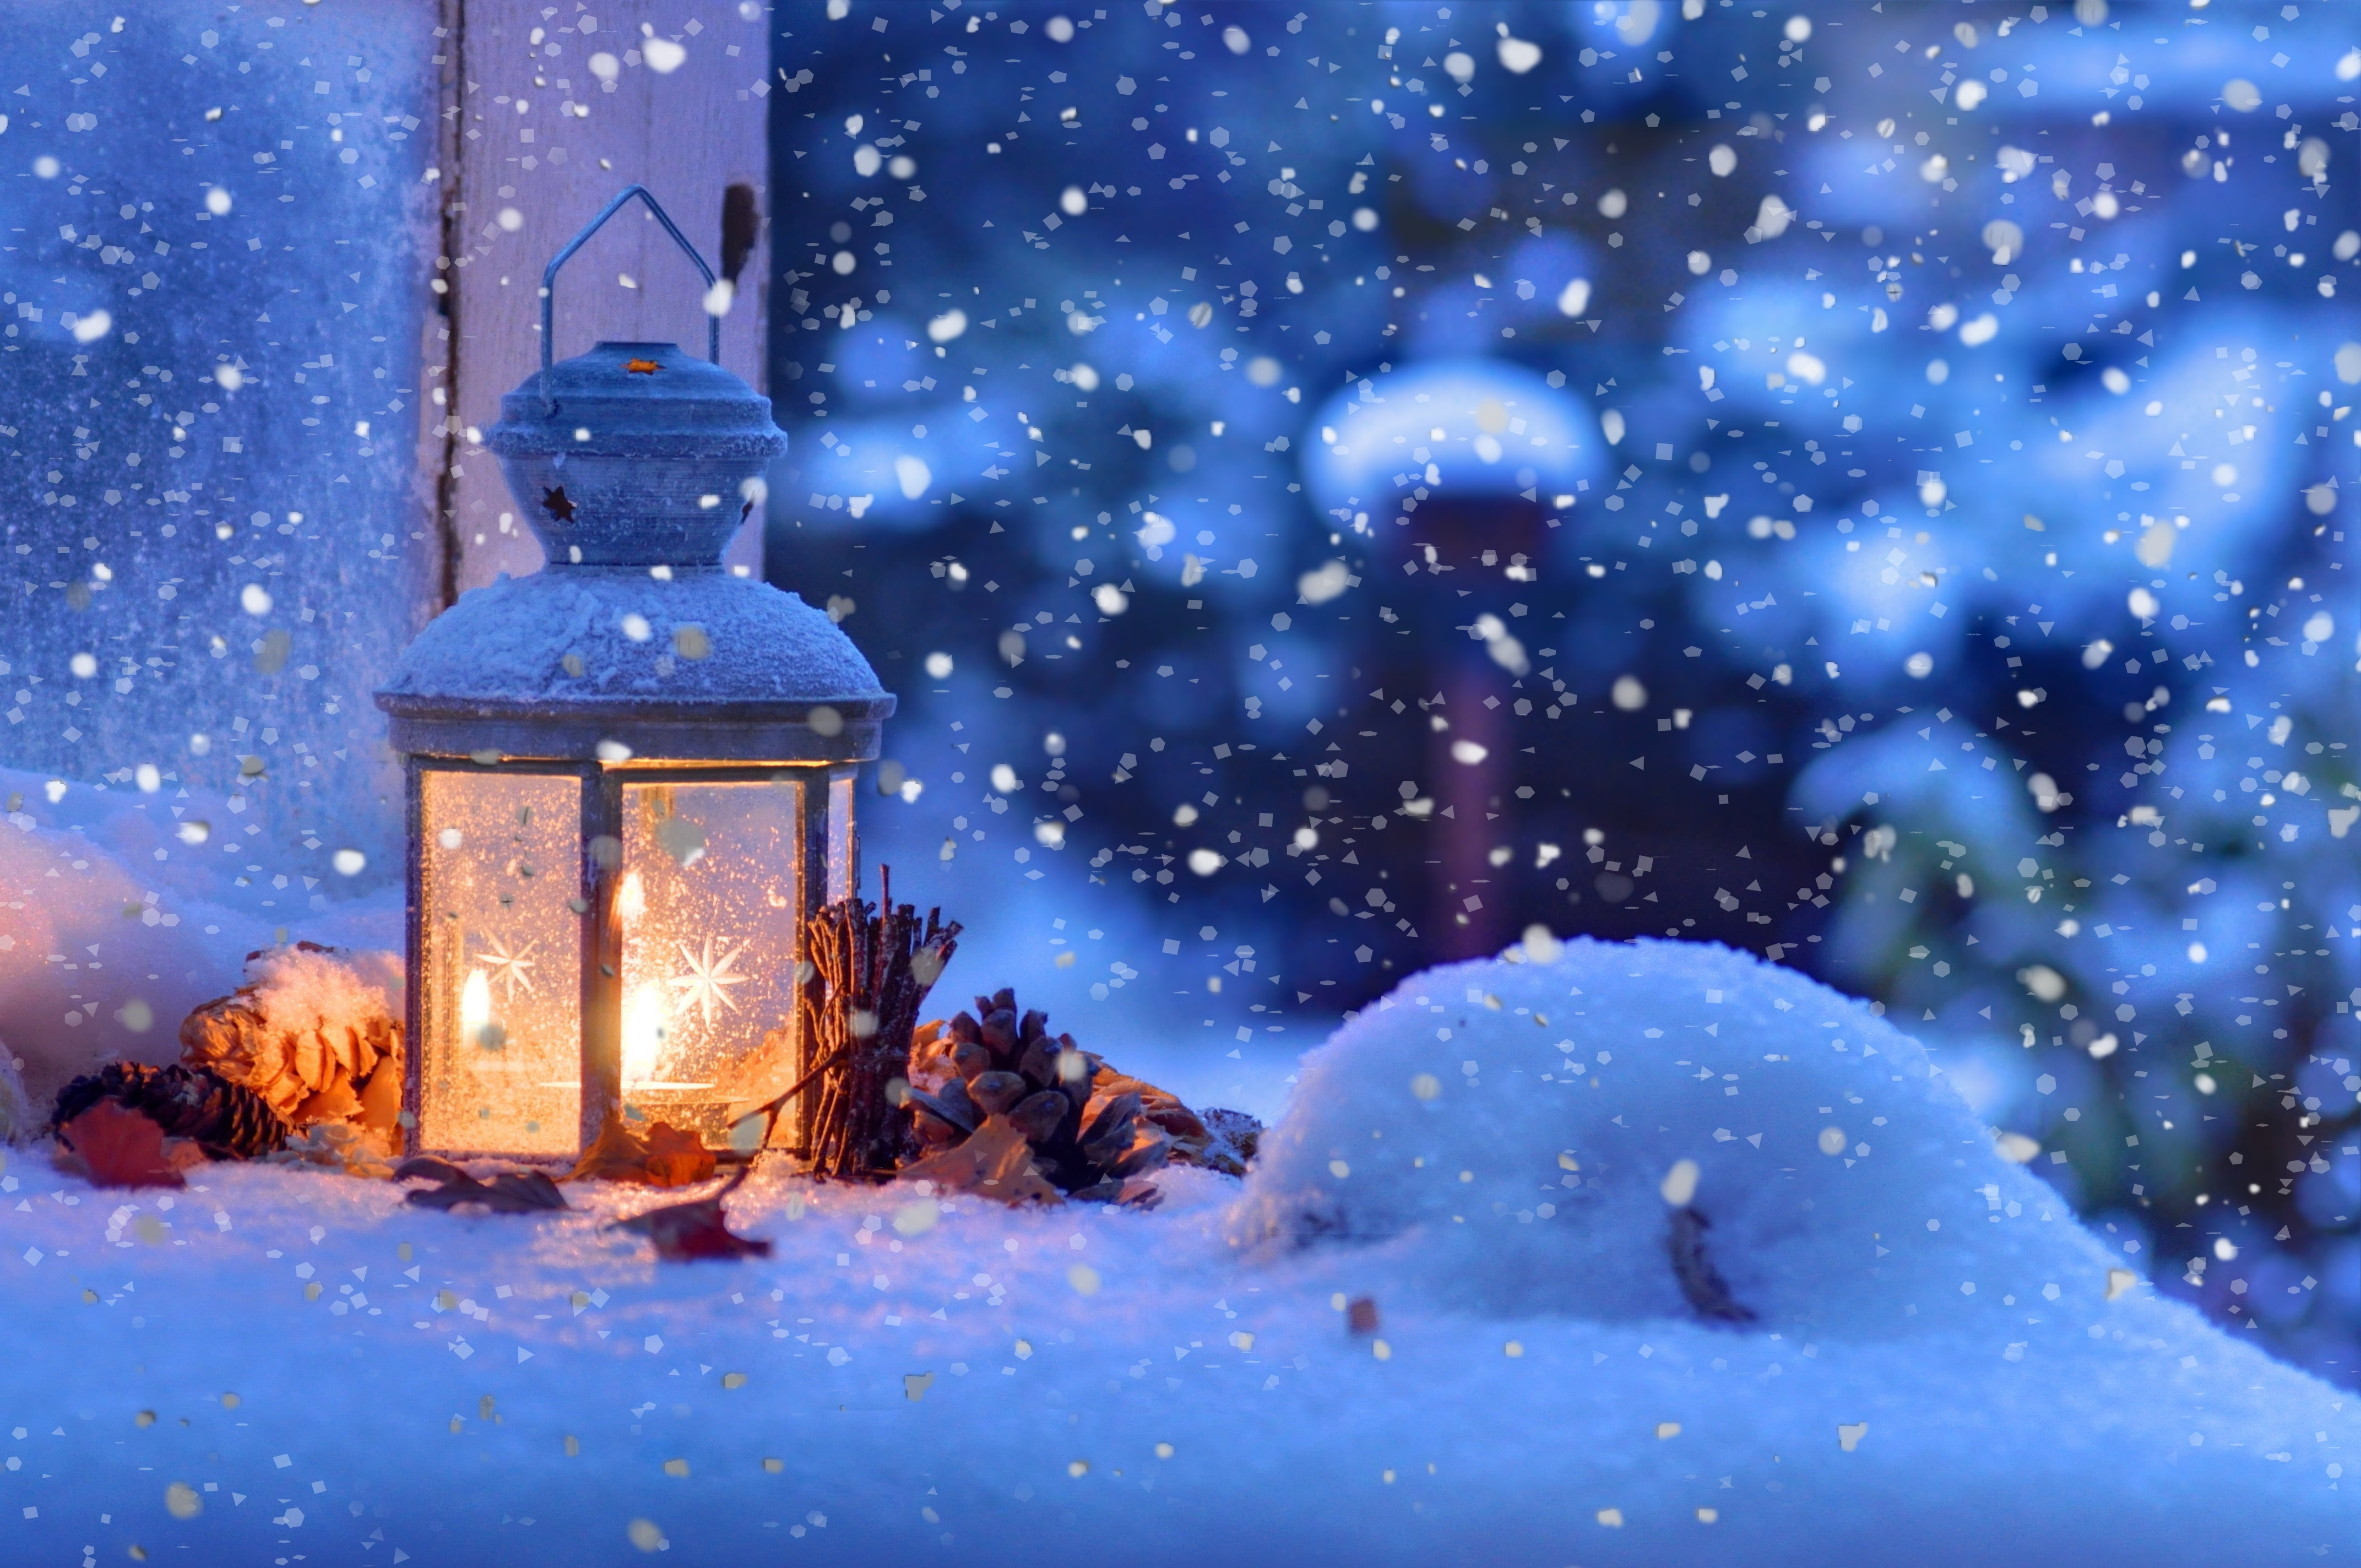 Christmas Winter Snow Wallpapers HD Desktop and Mobile 4287x2847